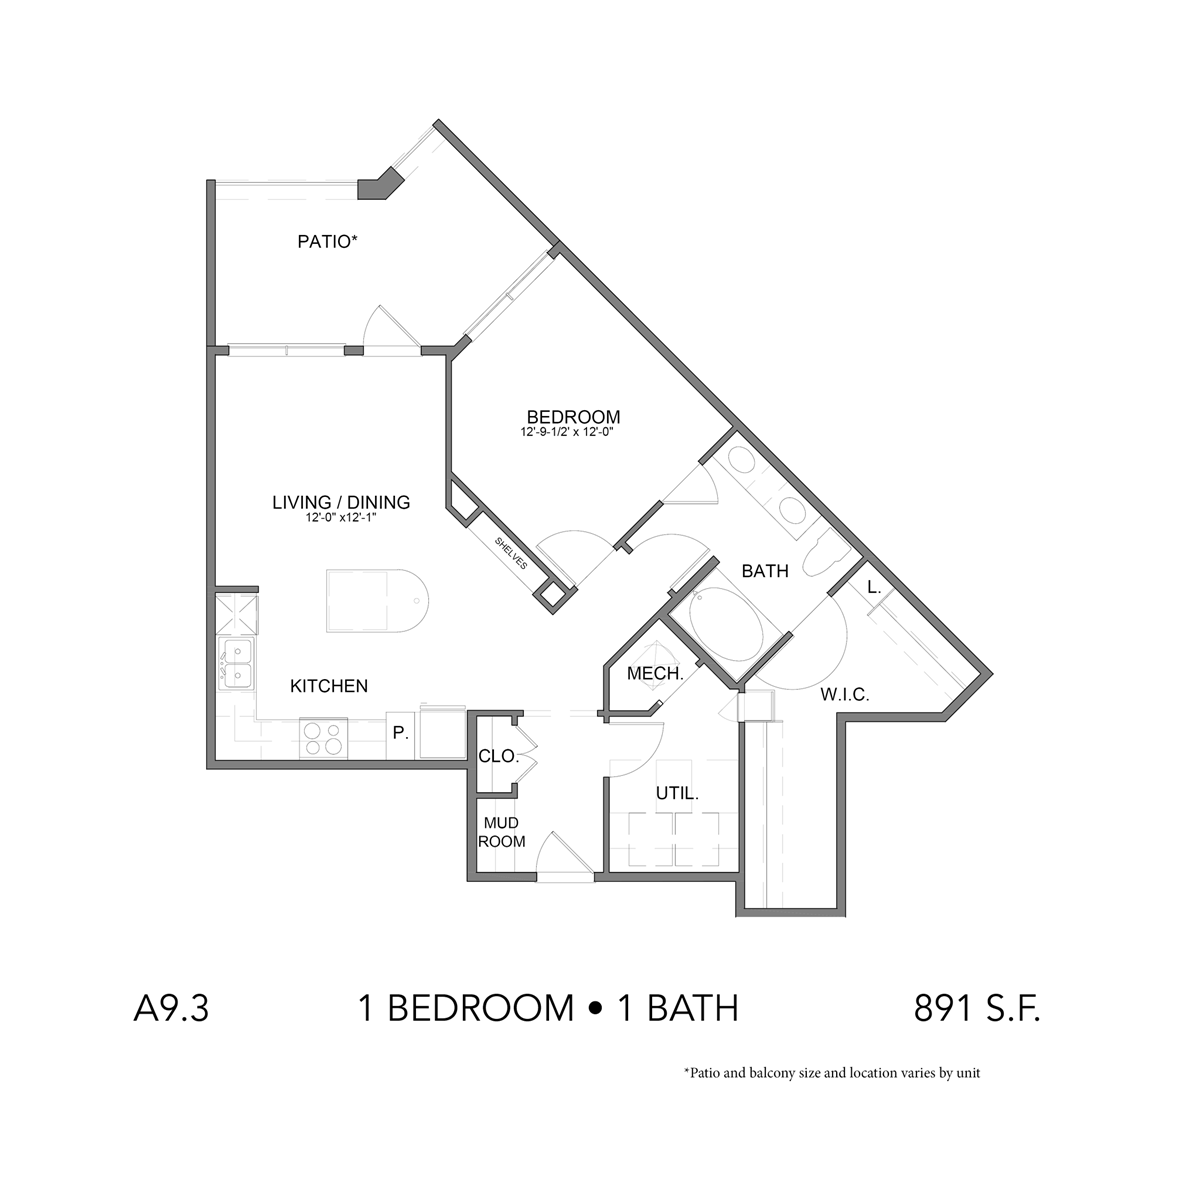 891 sq. ft. A9.3 floor plan